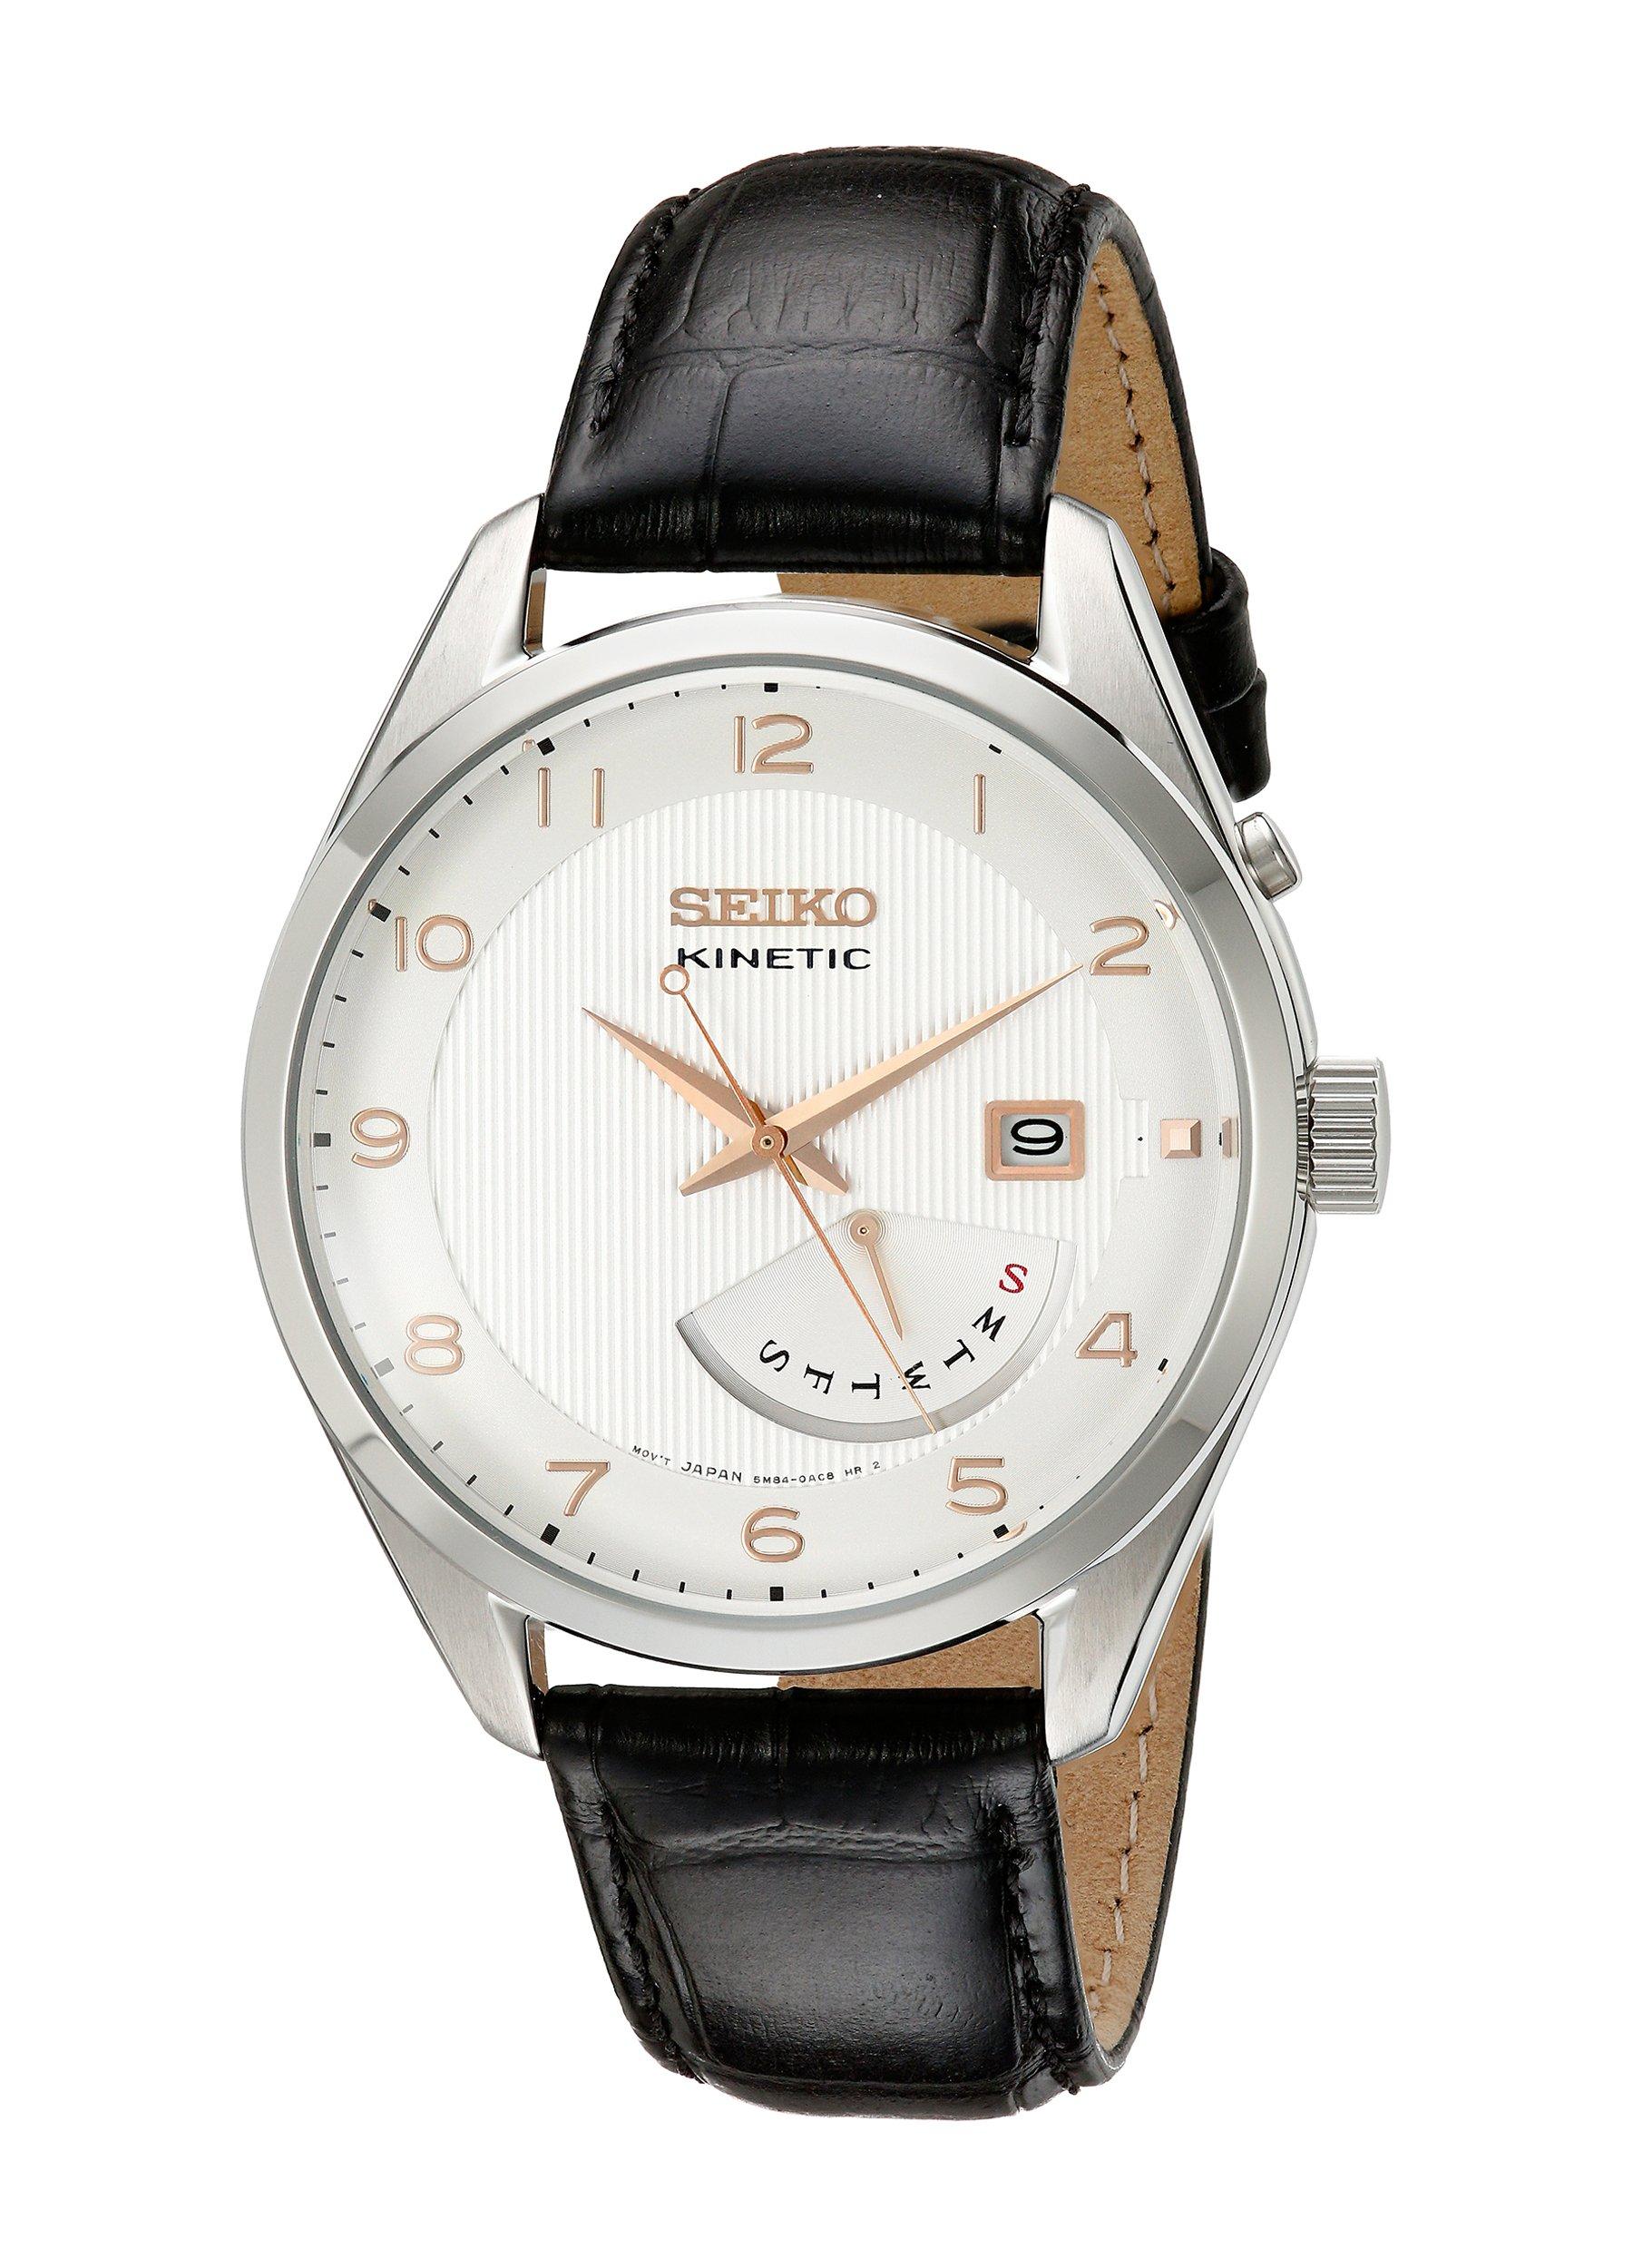 Seiko Men SRN049 Kinetic Stainless Steel Watch by SEIKO